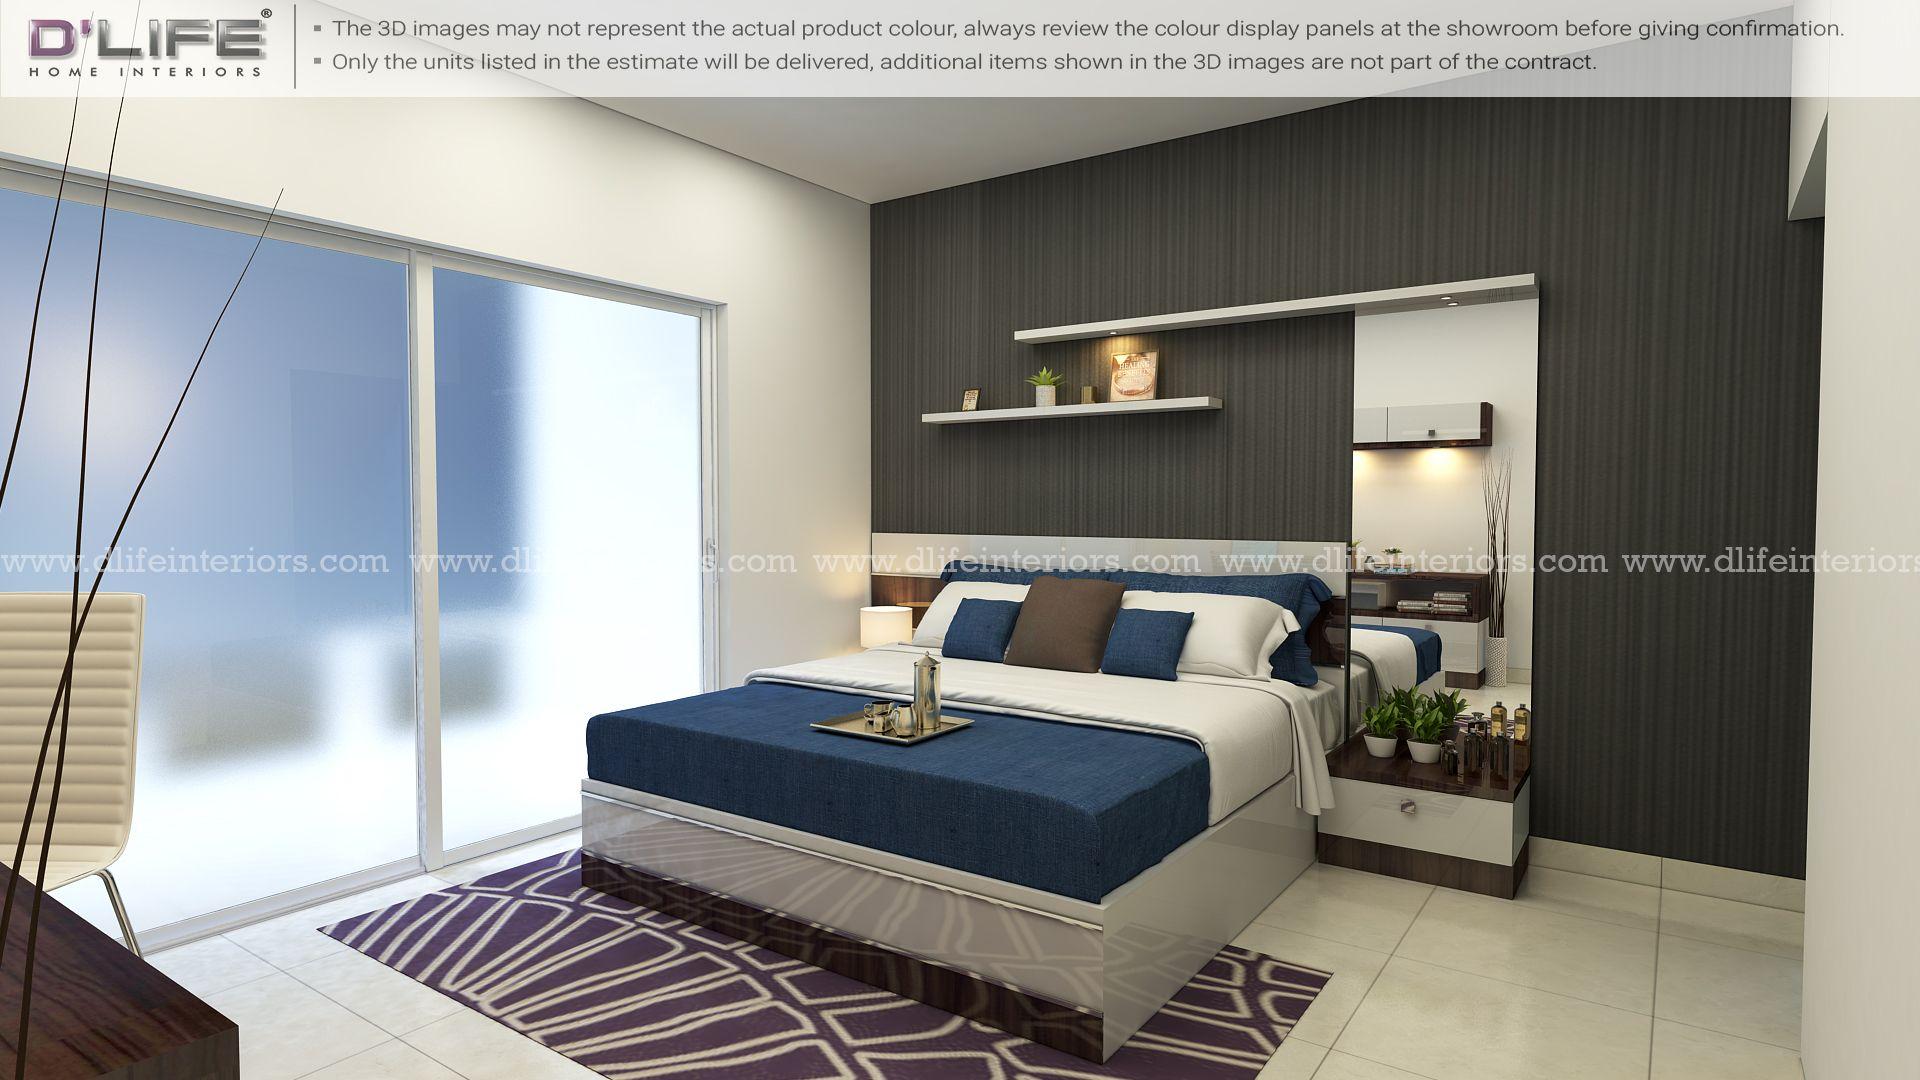 bedroom interior design furnishing kerala   master bedroom